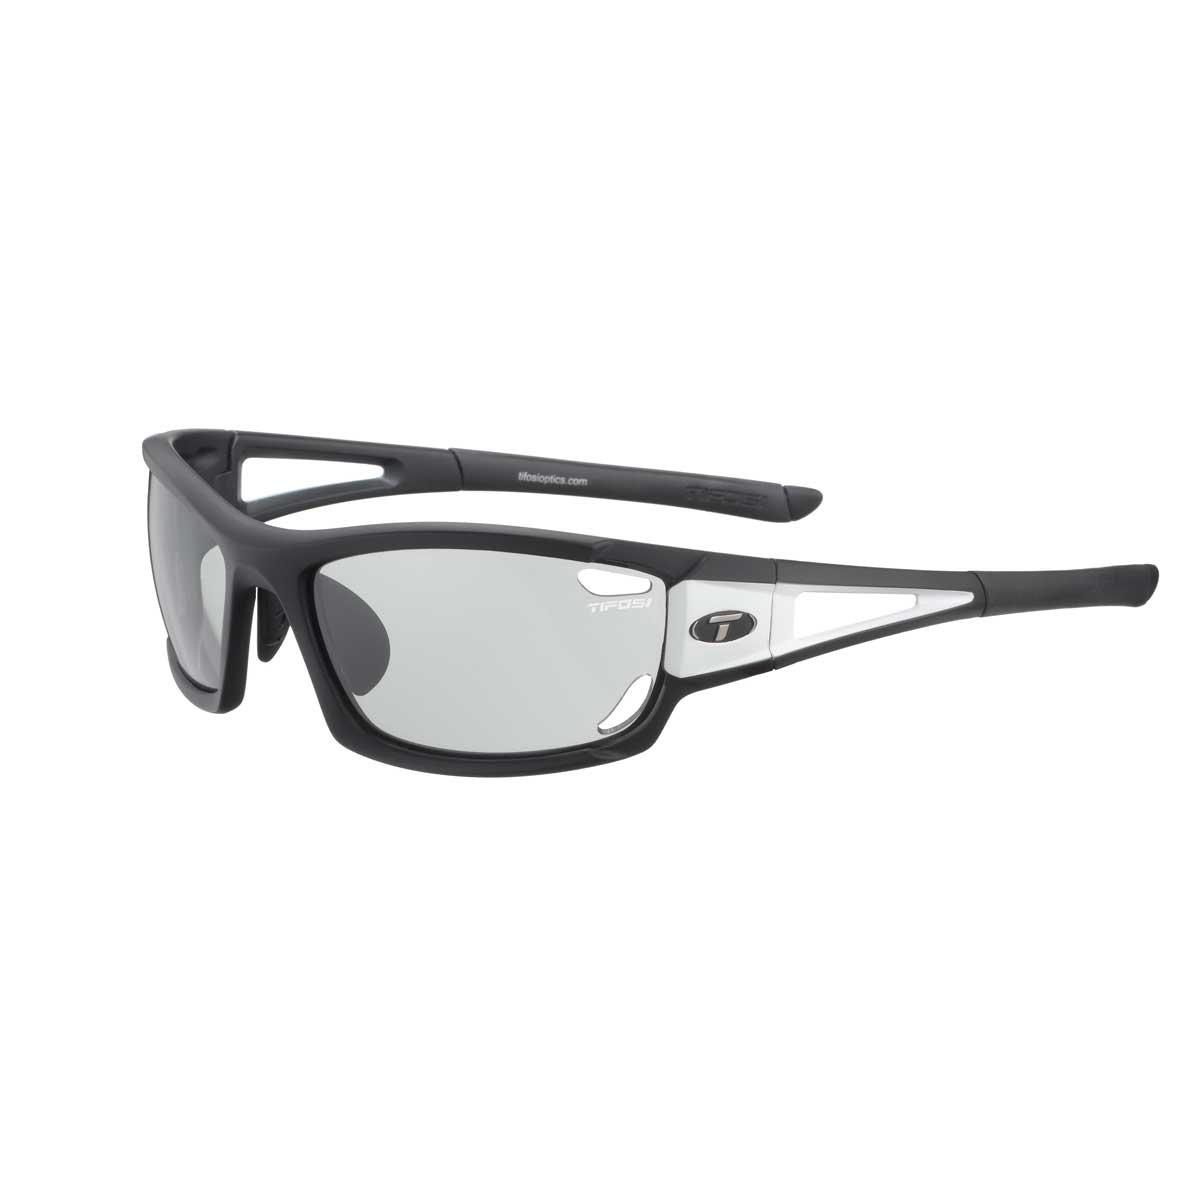 acda42af2e Amazon.com: Tifosi Dolomite 2.0 1020304831 Wrap Sunglasses,Black &  White,141 mm: Clothing